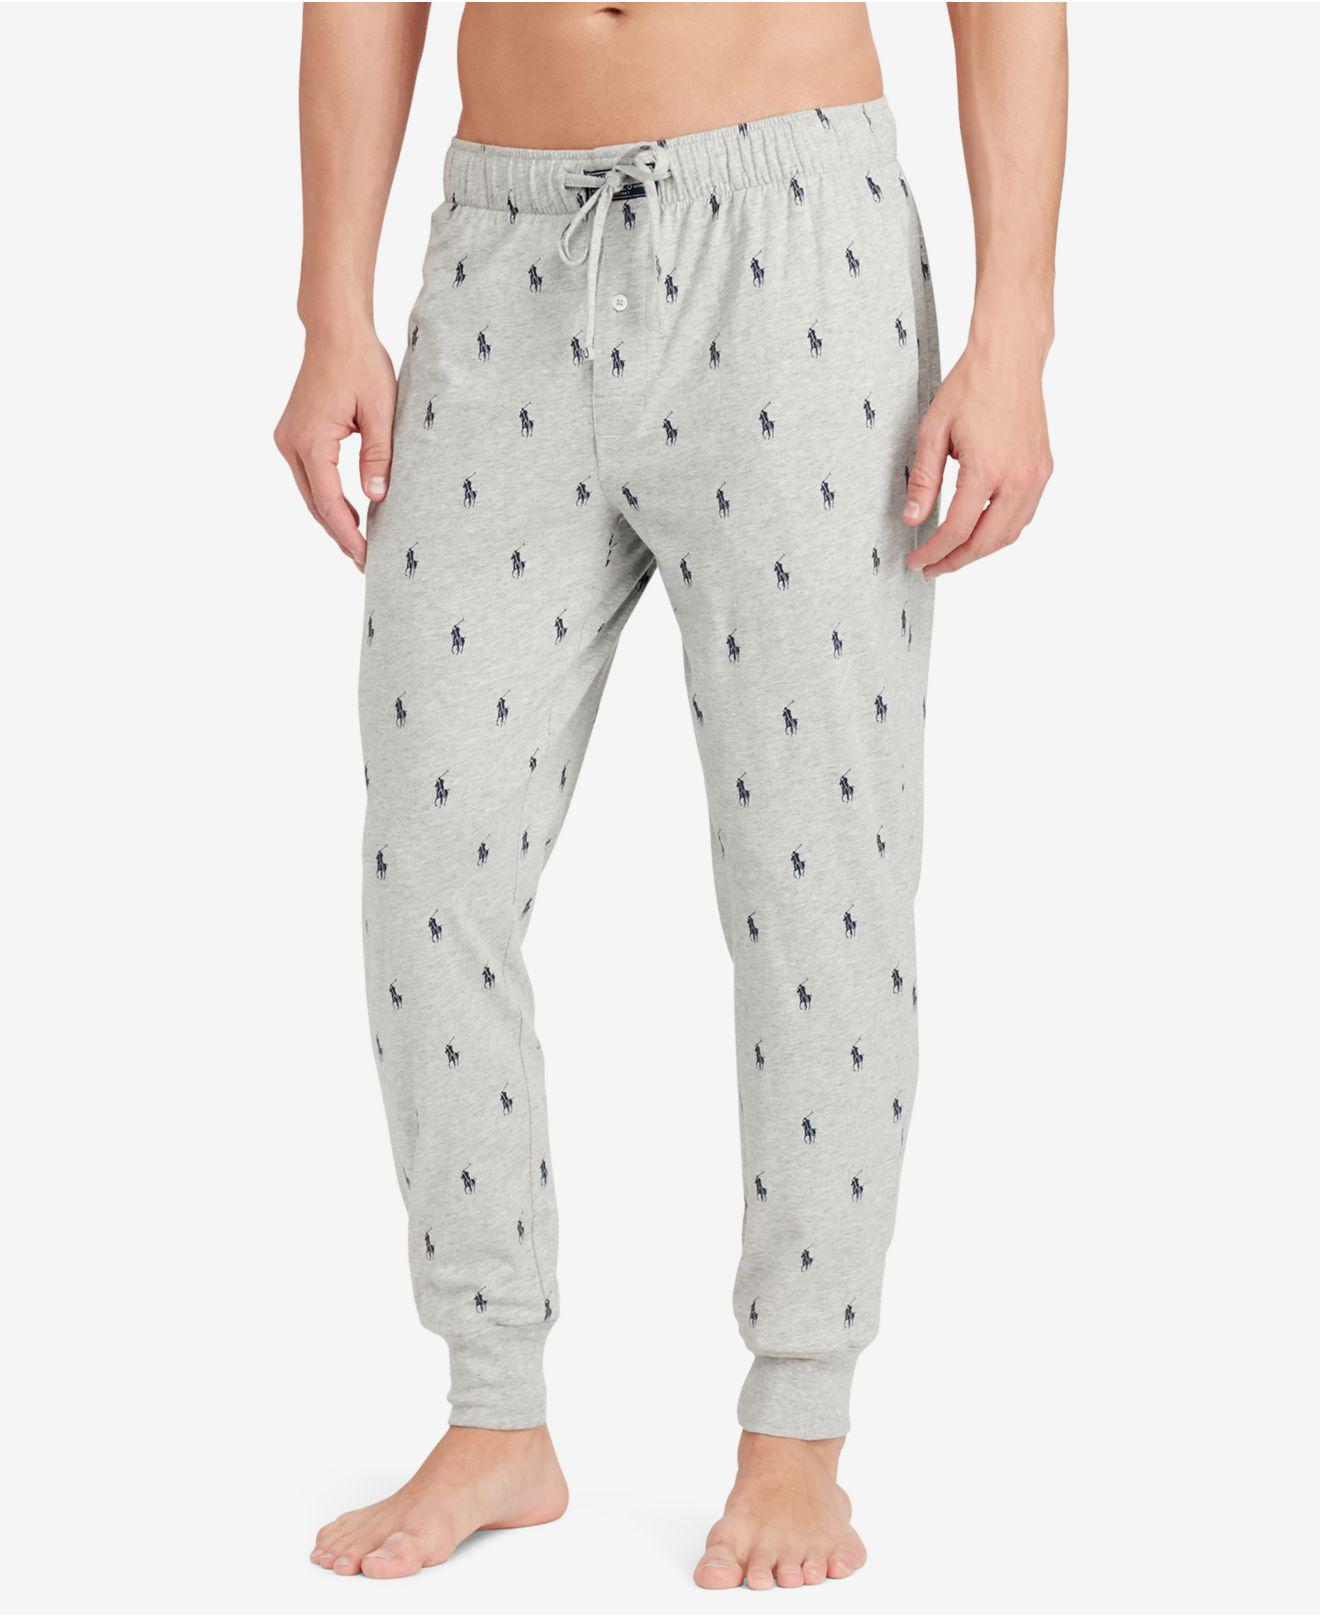 0be81715c308 Lyst - Polo Ralph Lauren Sleepwear in Gray for Men - Save 29%